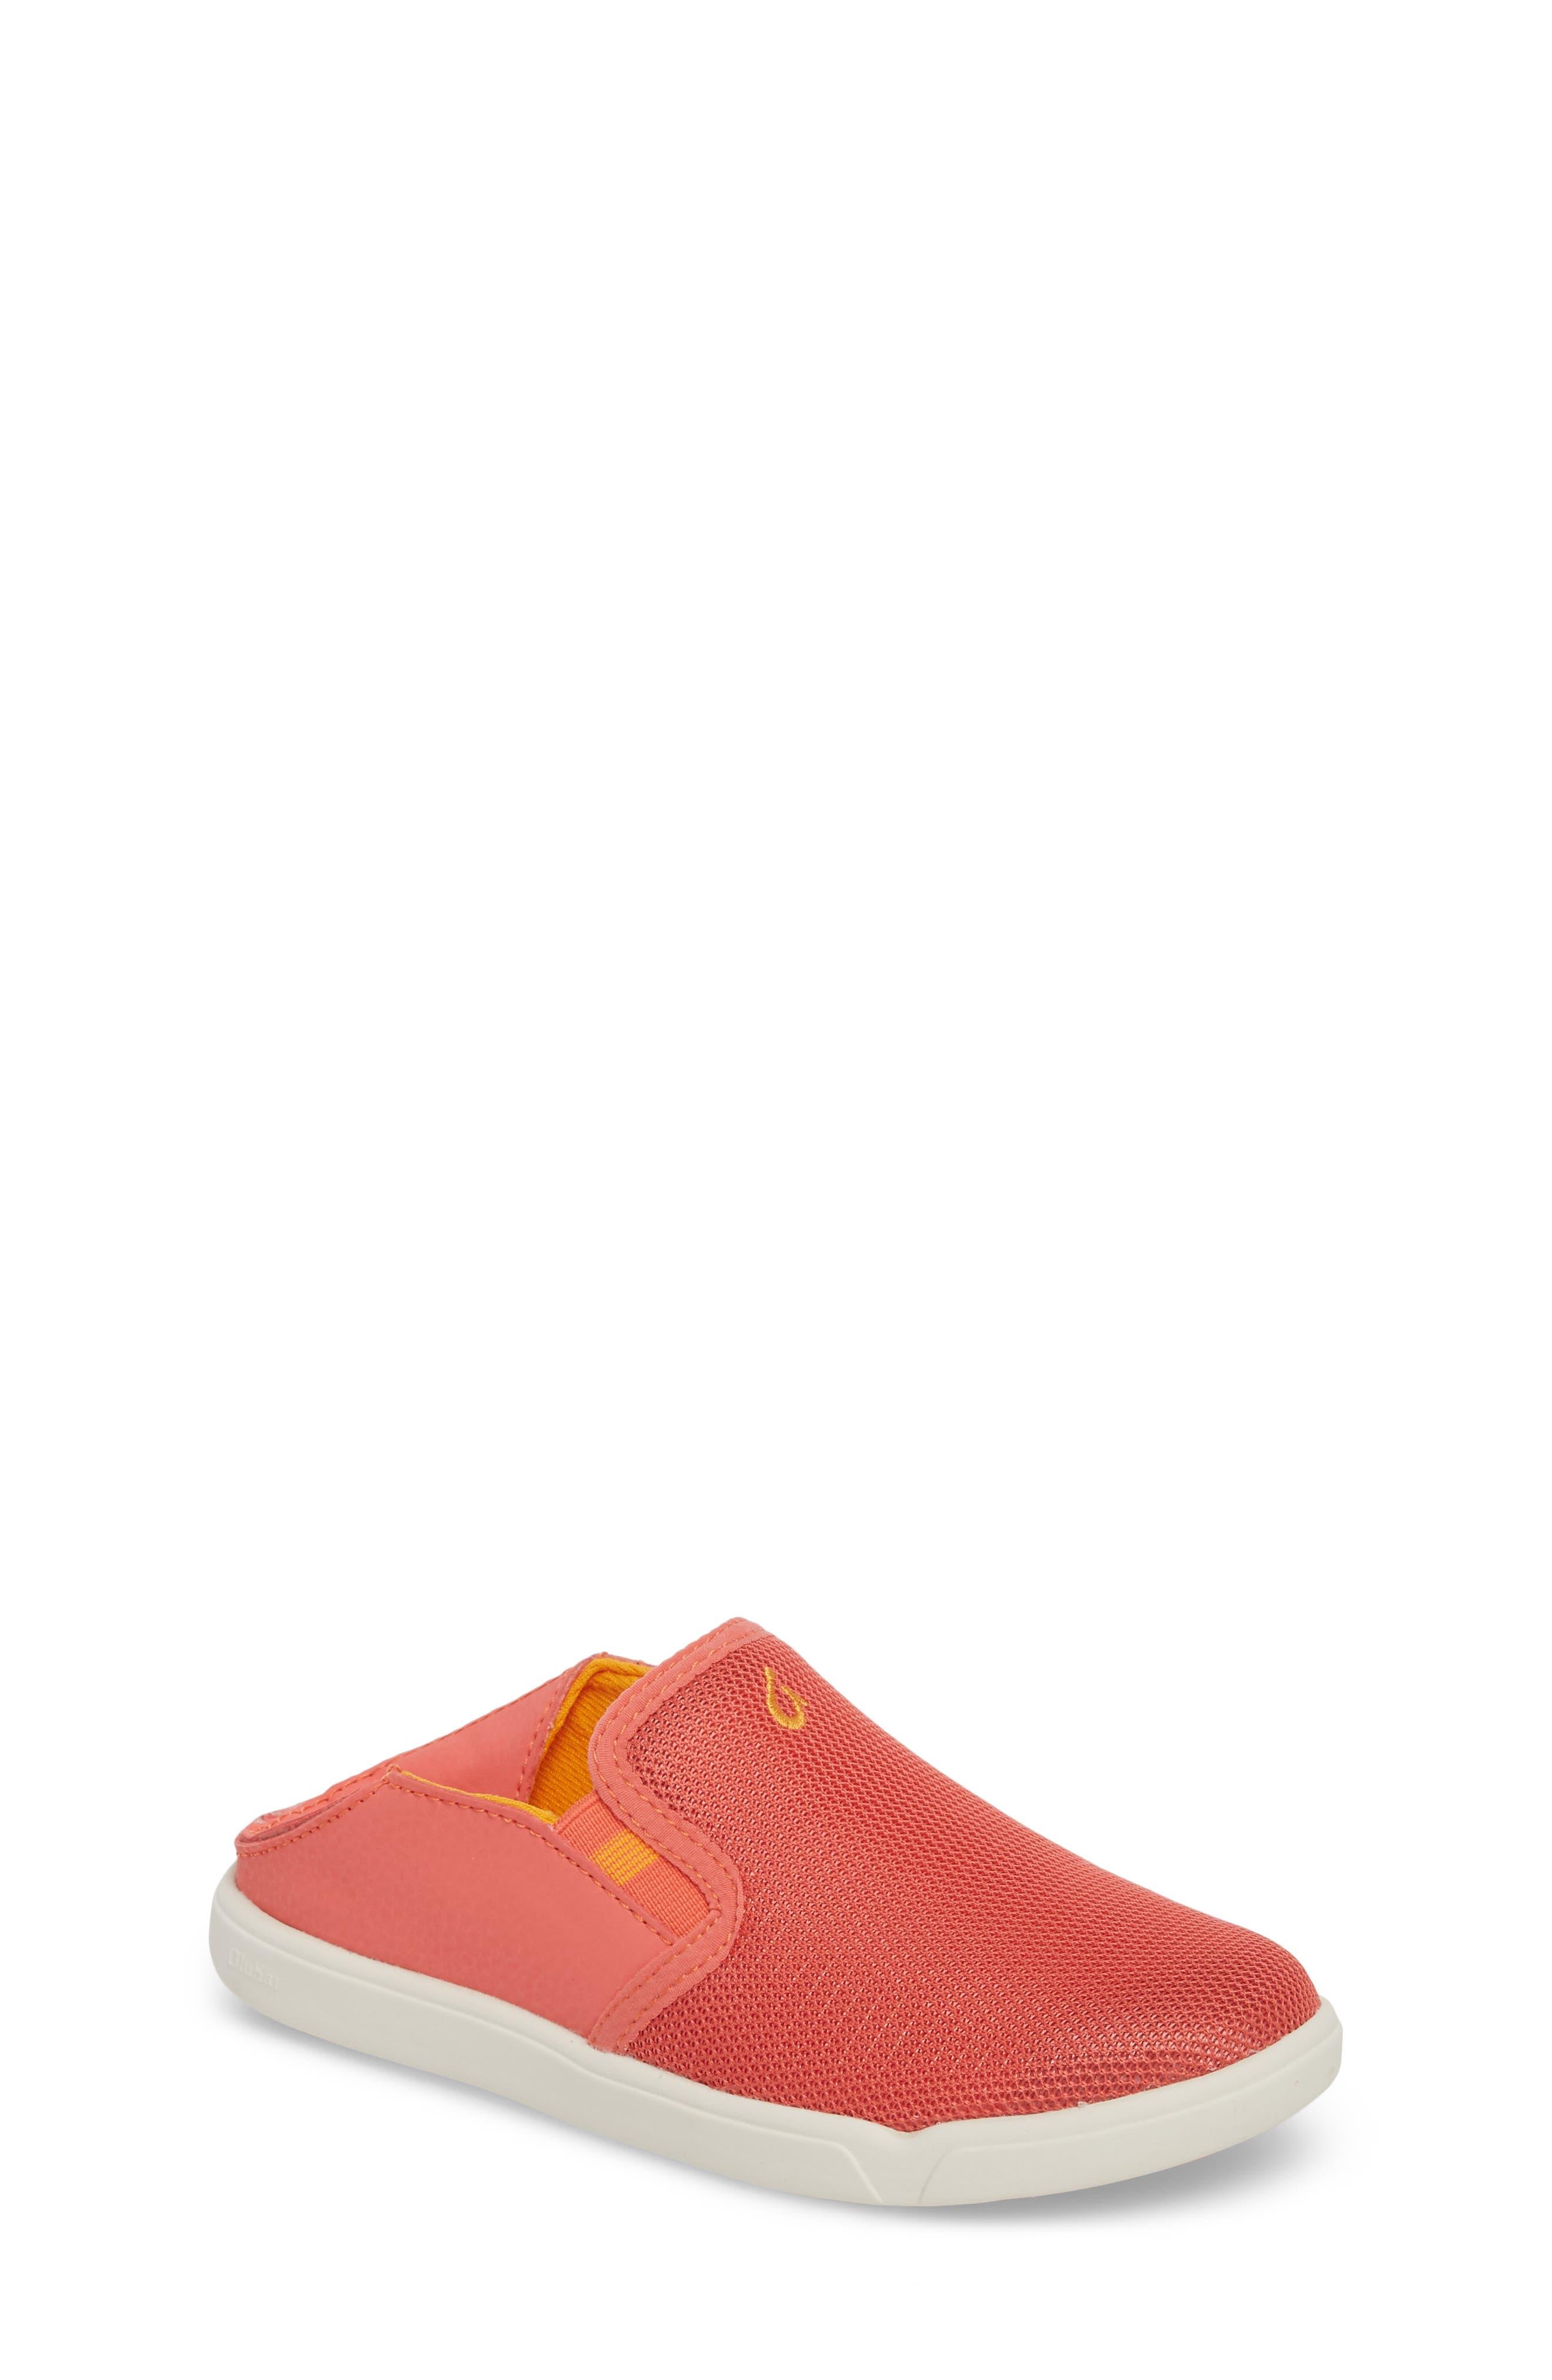 Girls Olukai Pehuea Maka Collapsible SlipOn Size 3 M  Coral